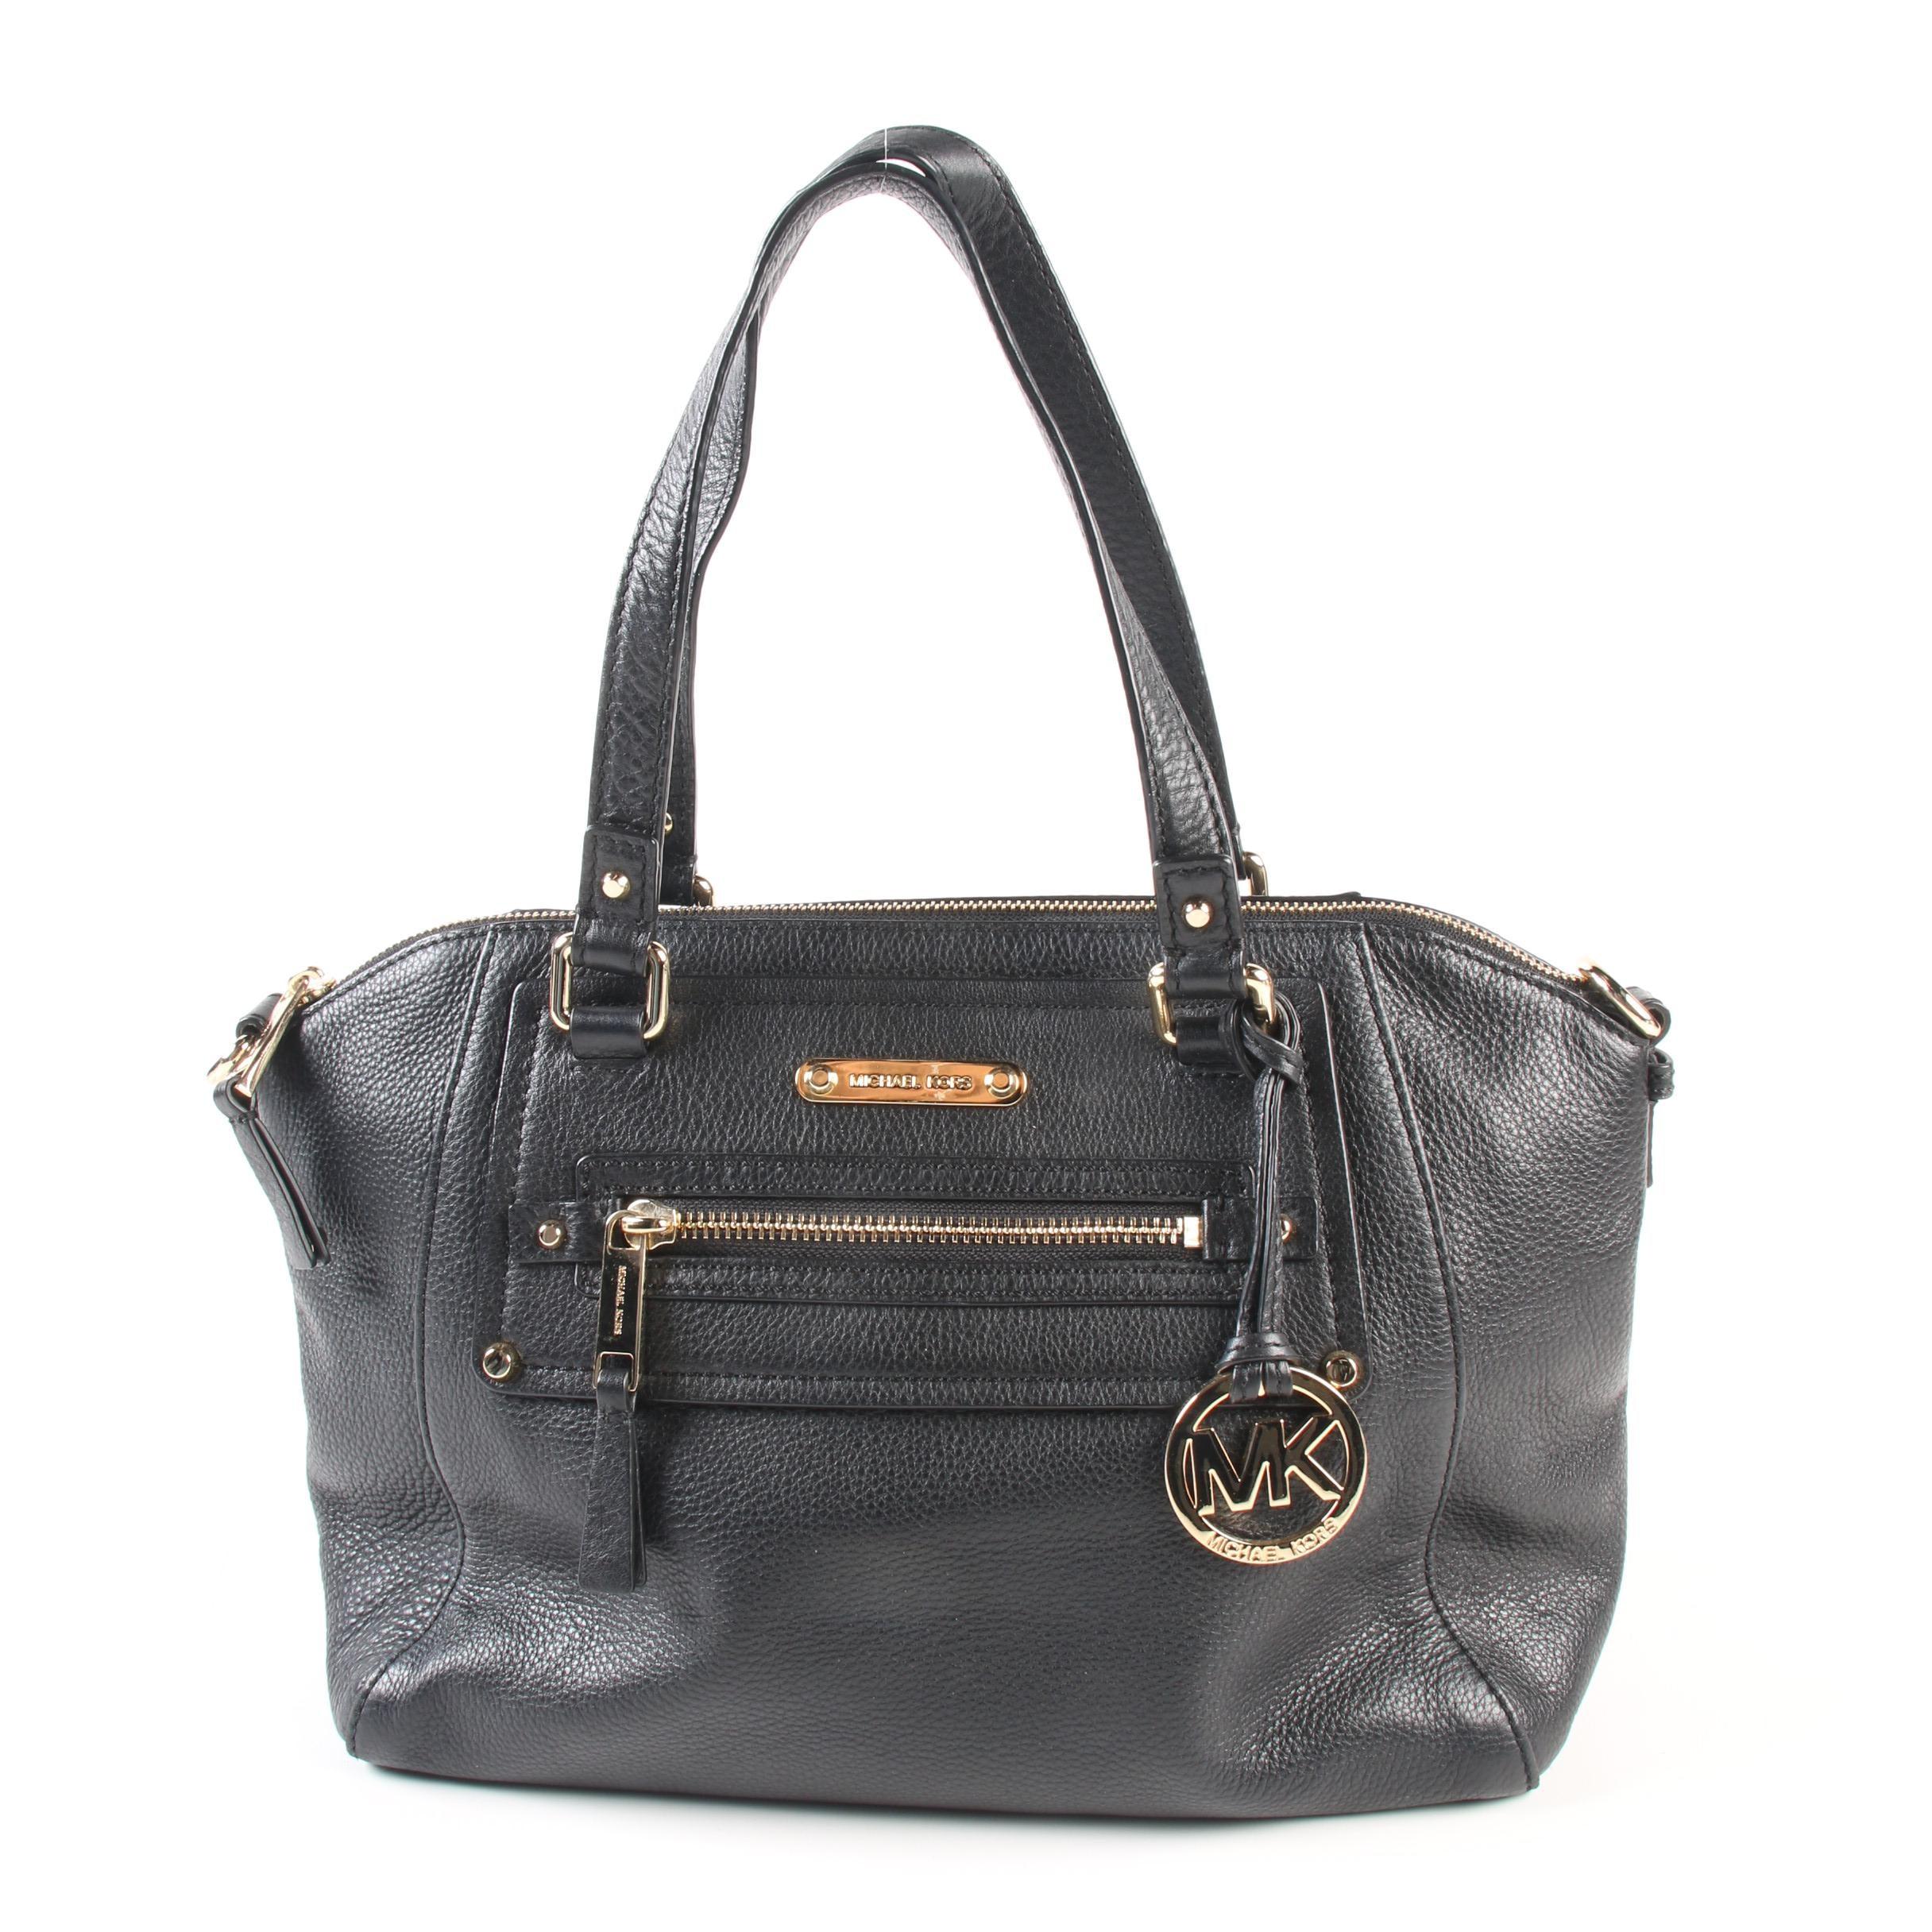 MICHAEL Michael Kors Black Pebbled Leather Satchel